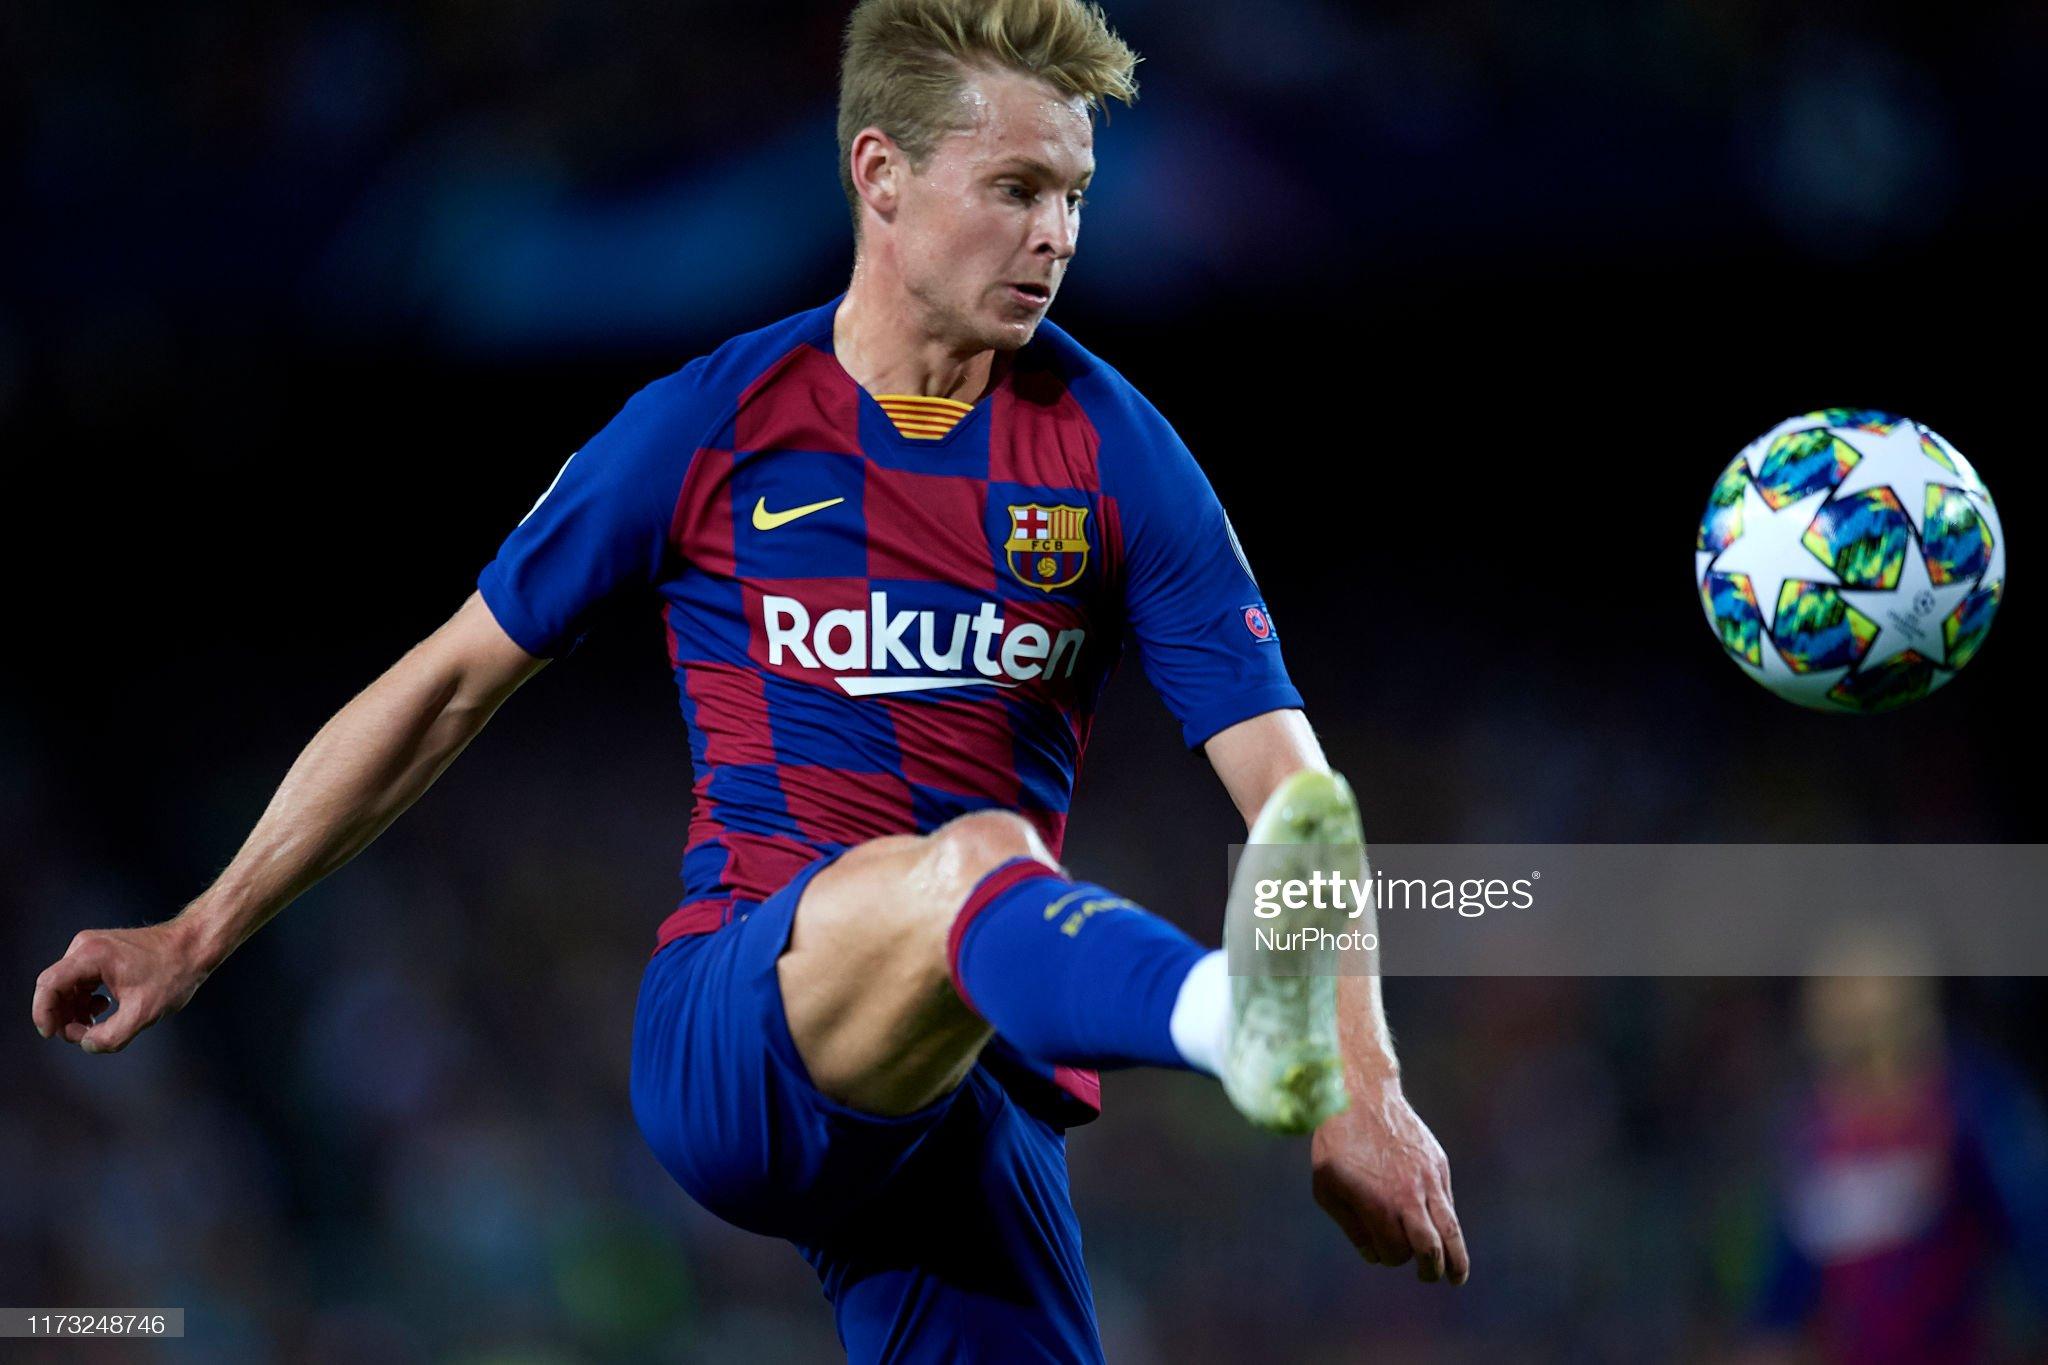 صور مباراة : برشلونة - إنتر 2-1 ( 02-10-2019 )  Frenkie-de-jong-of-barcelona-controls-the-ball-during-the-uefa-f-picture-id1173248746?s=2048x2048